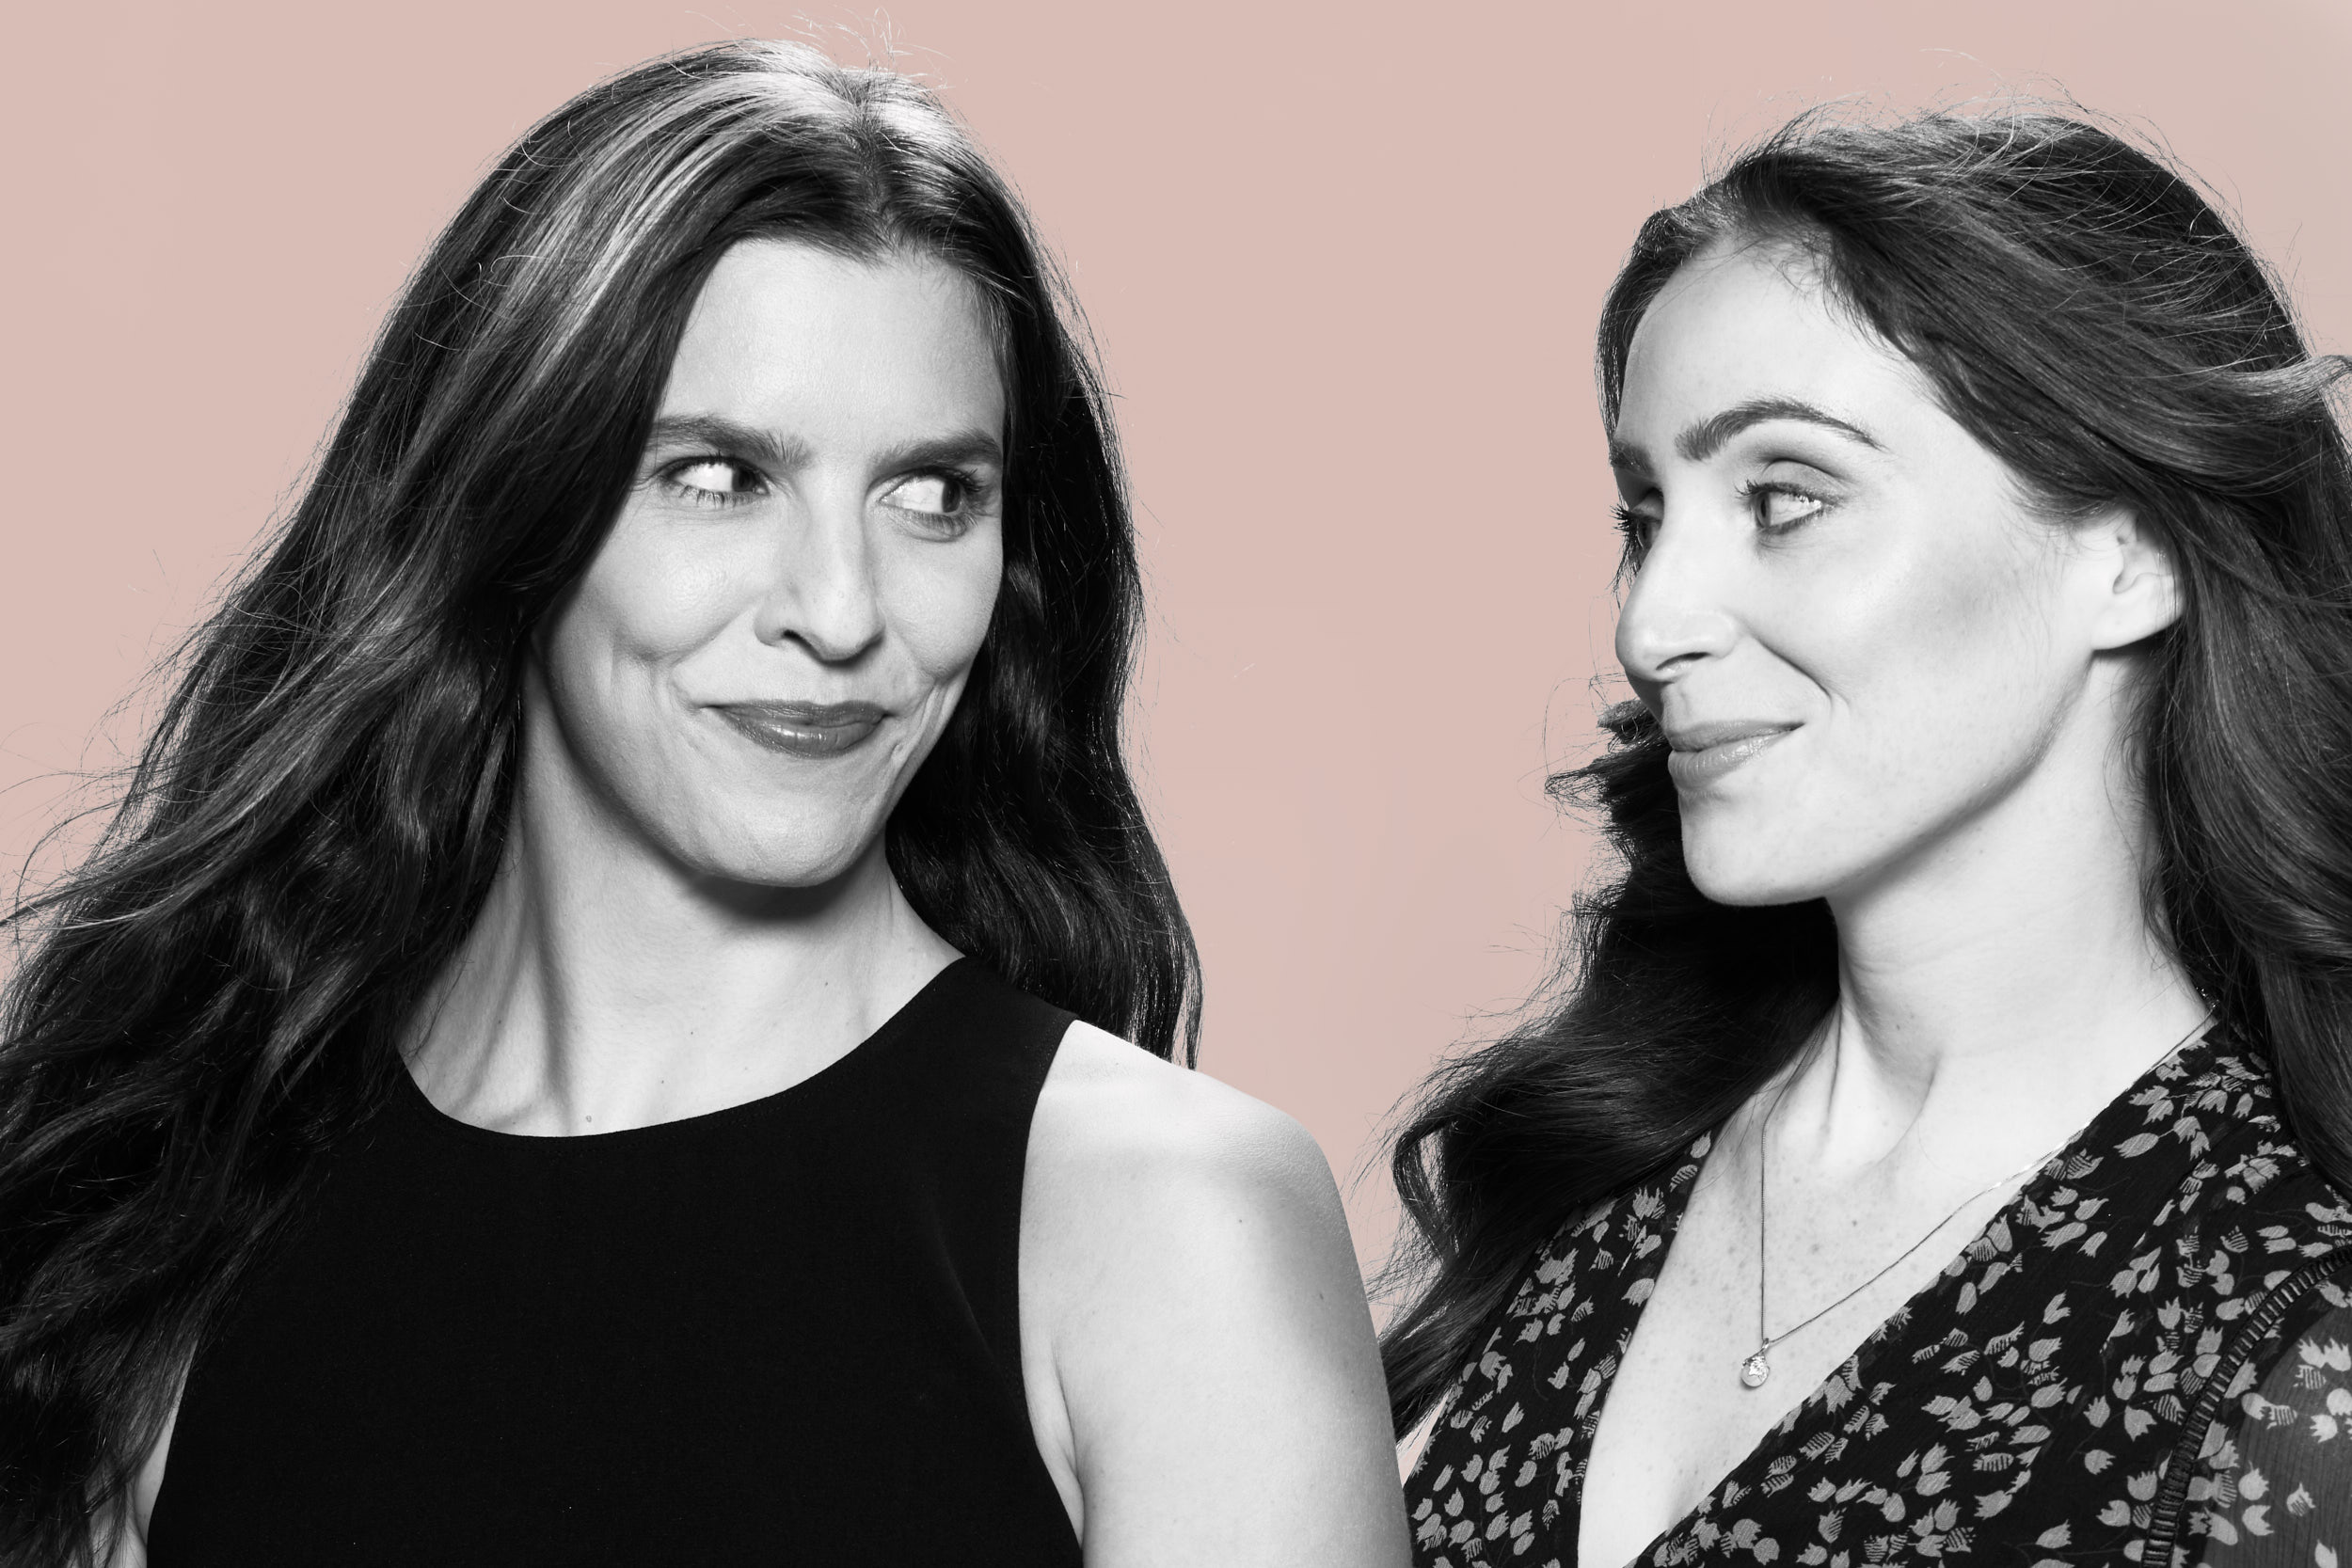 Fat Mascara's Jennifer Goldstein and Jessica Matlin